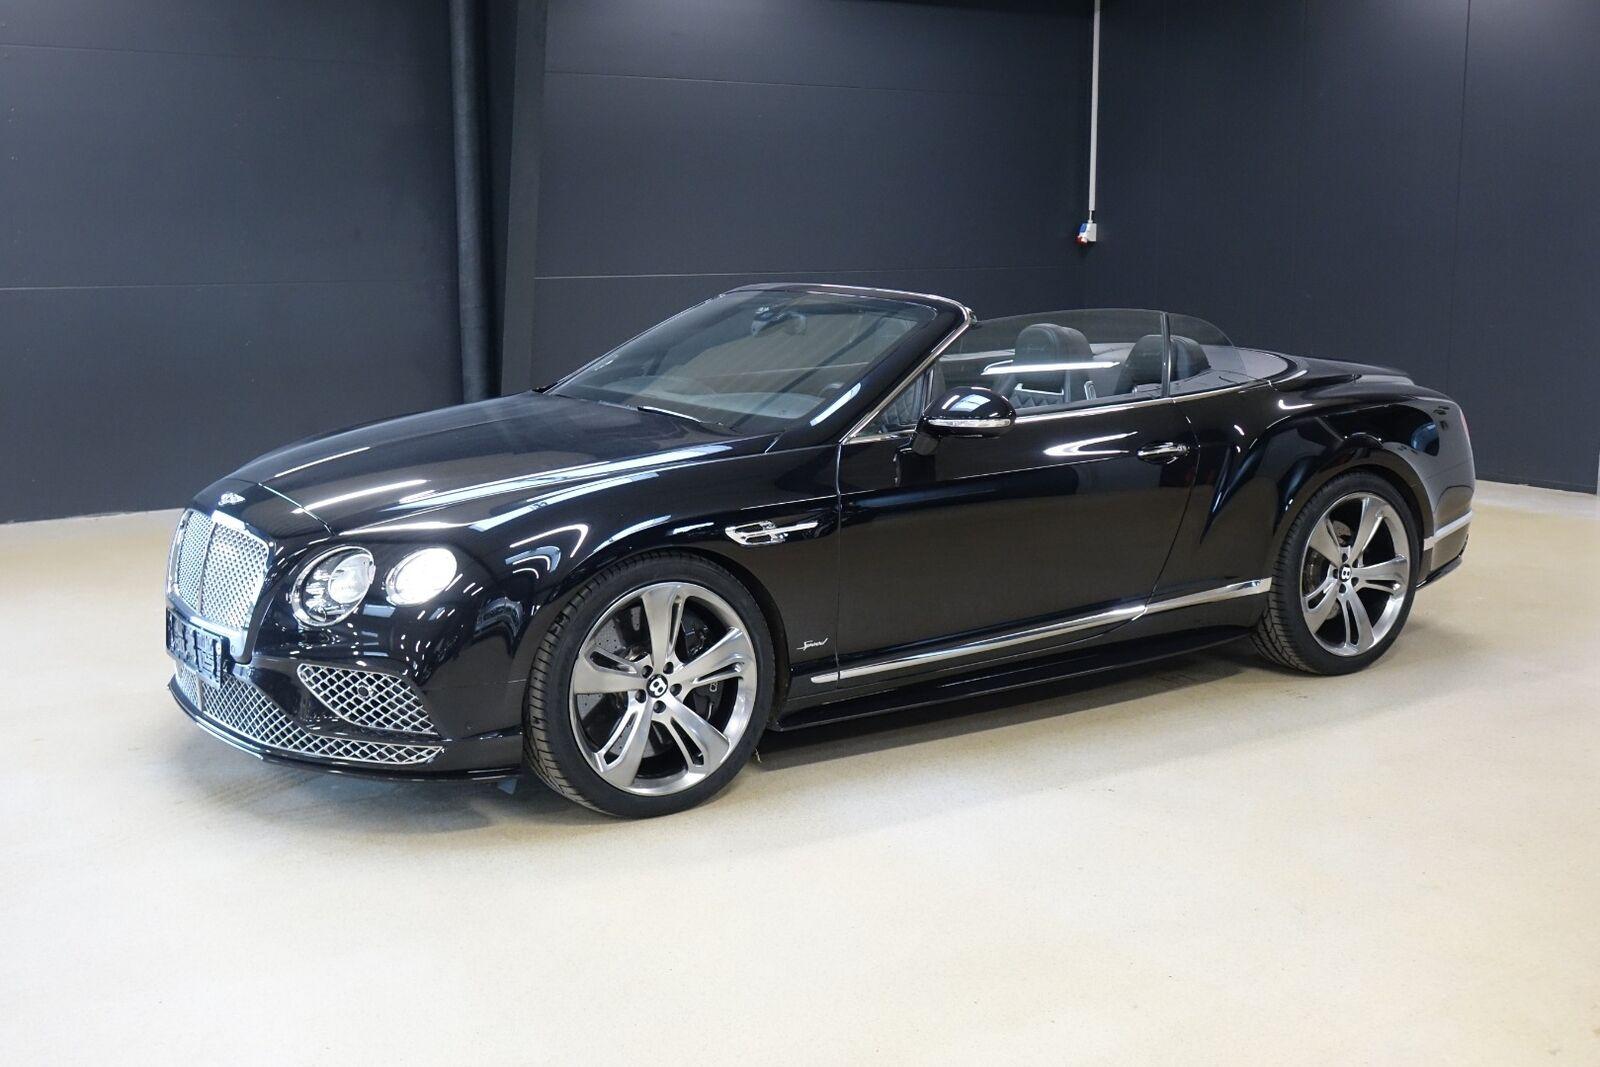 Bentley Continental GT 6,0 W12 Convertible Speed aut. 2d